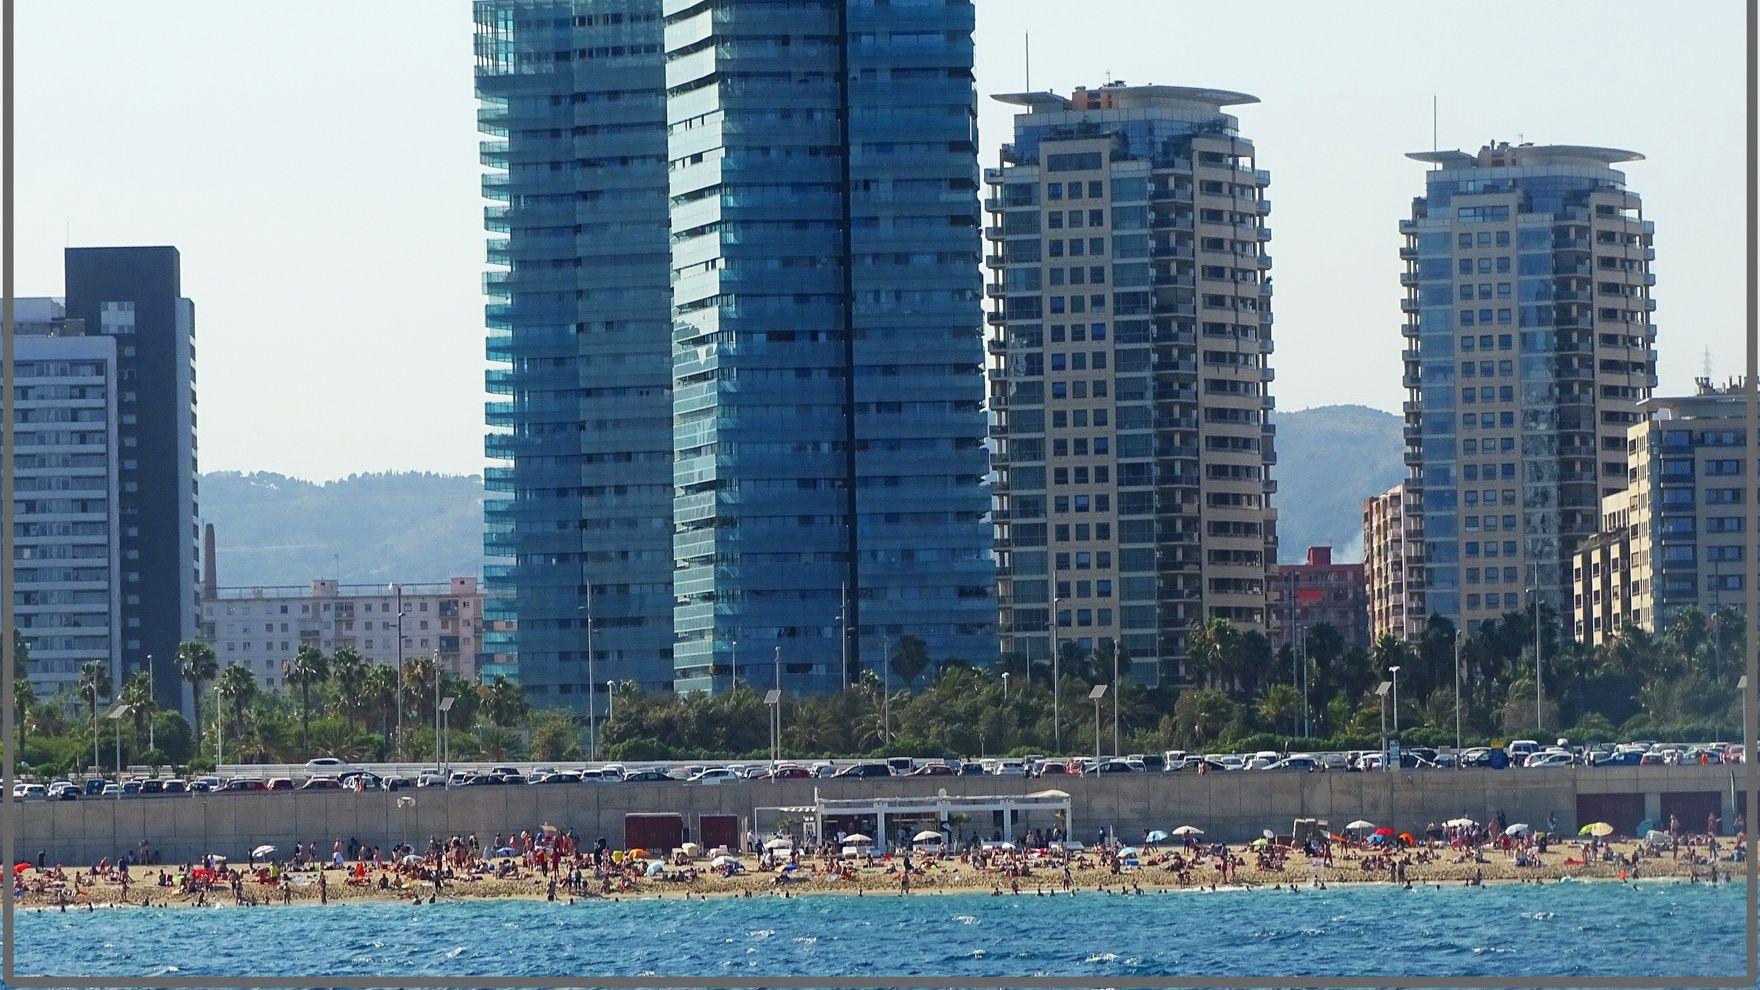 Курсы выходного дня в Барселоне